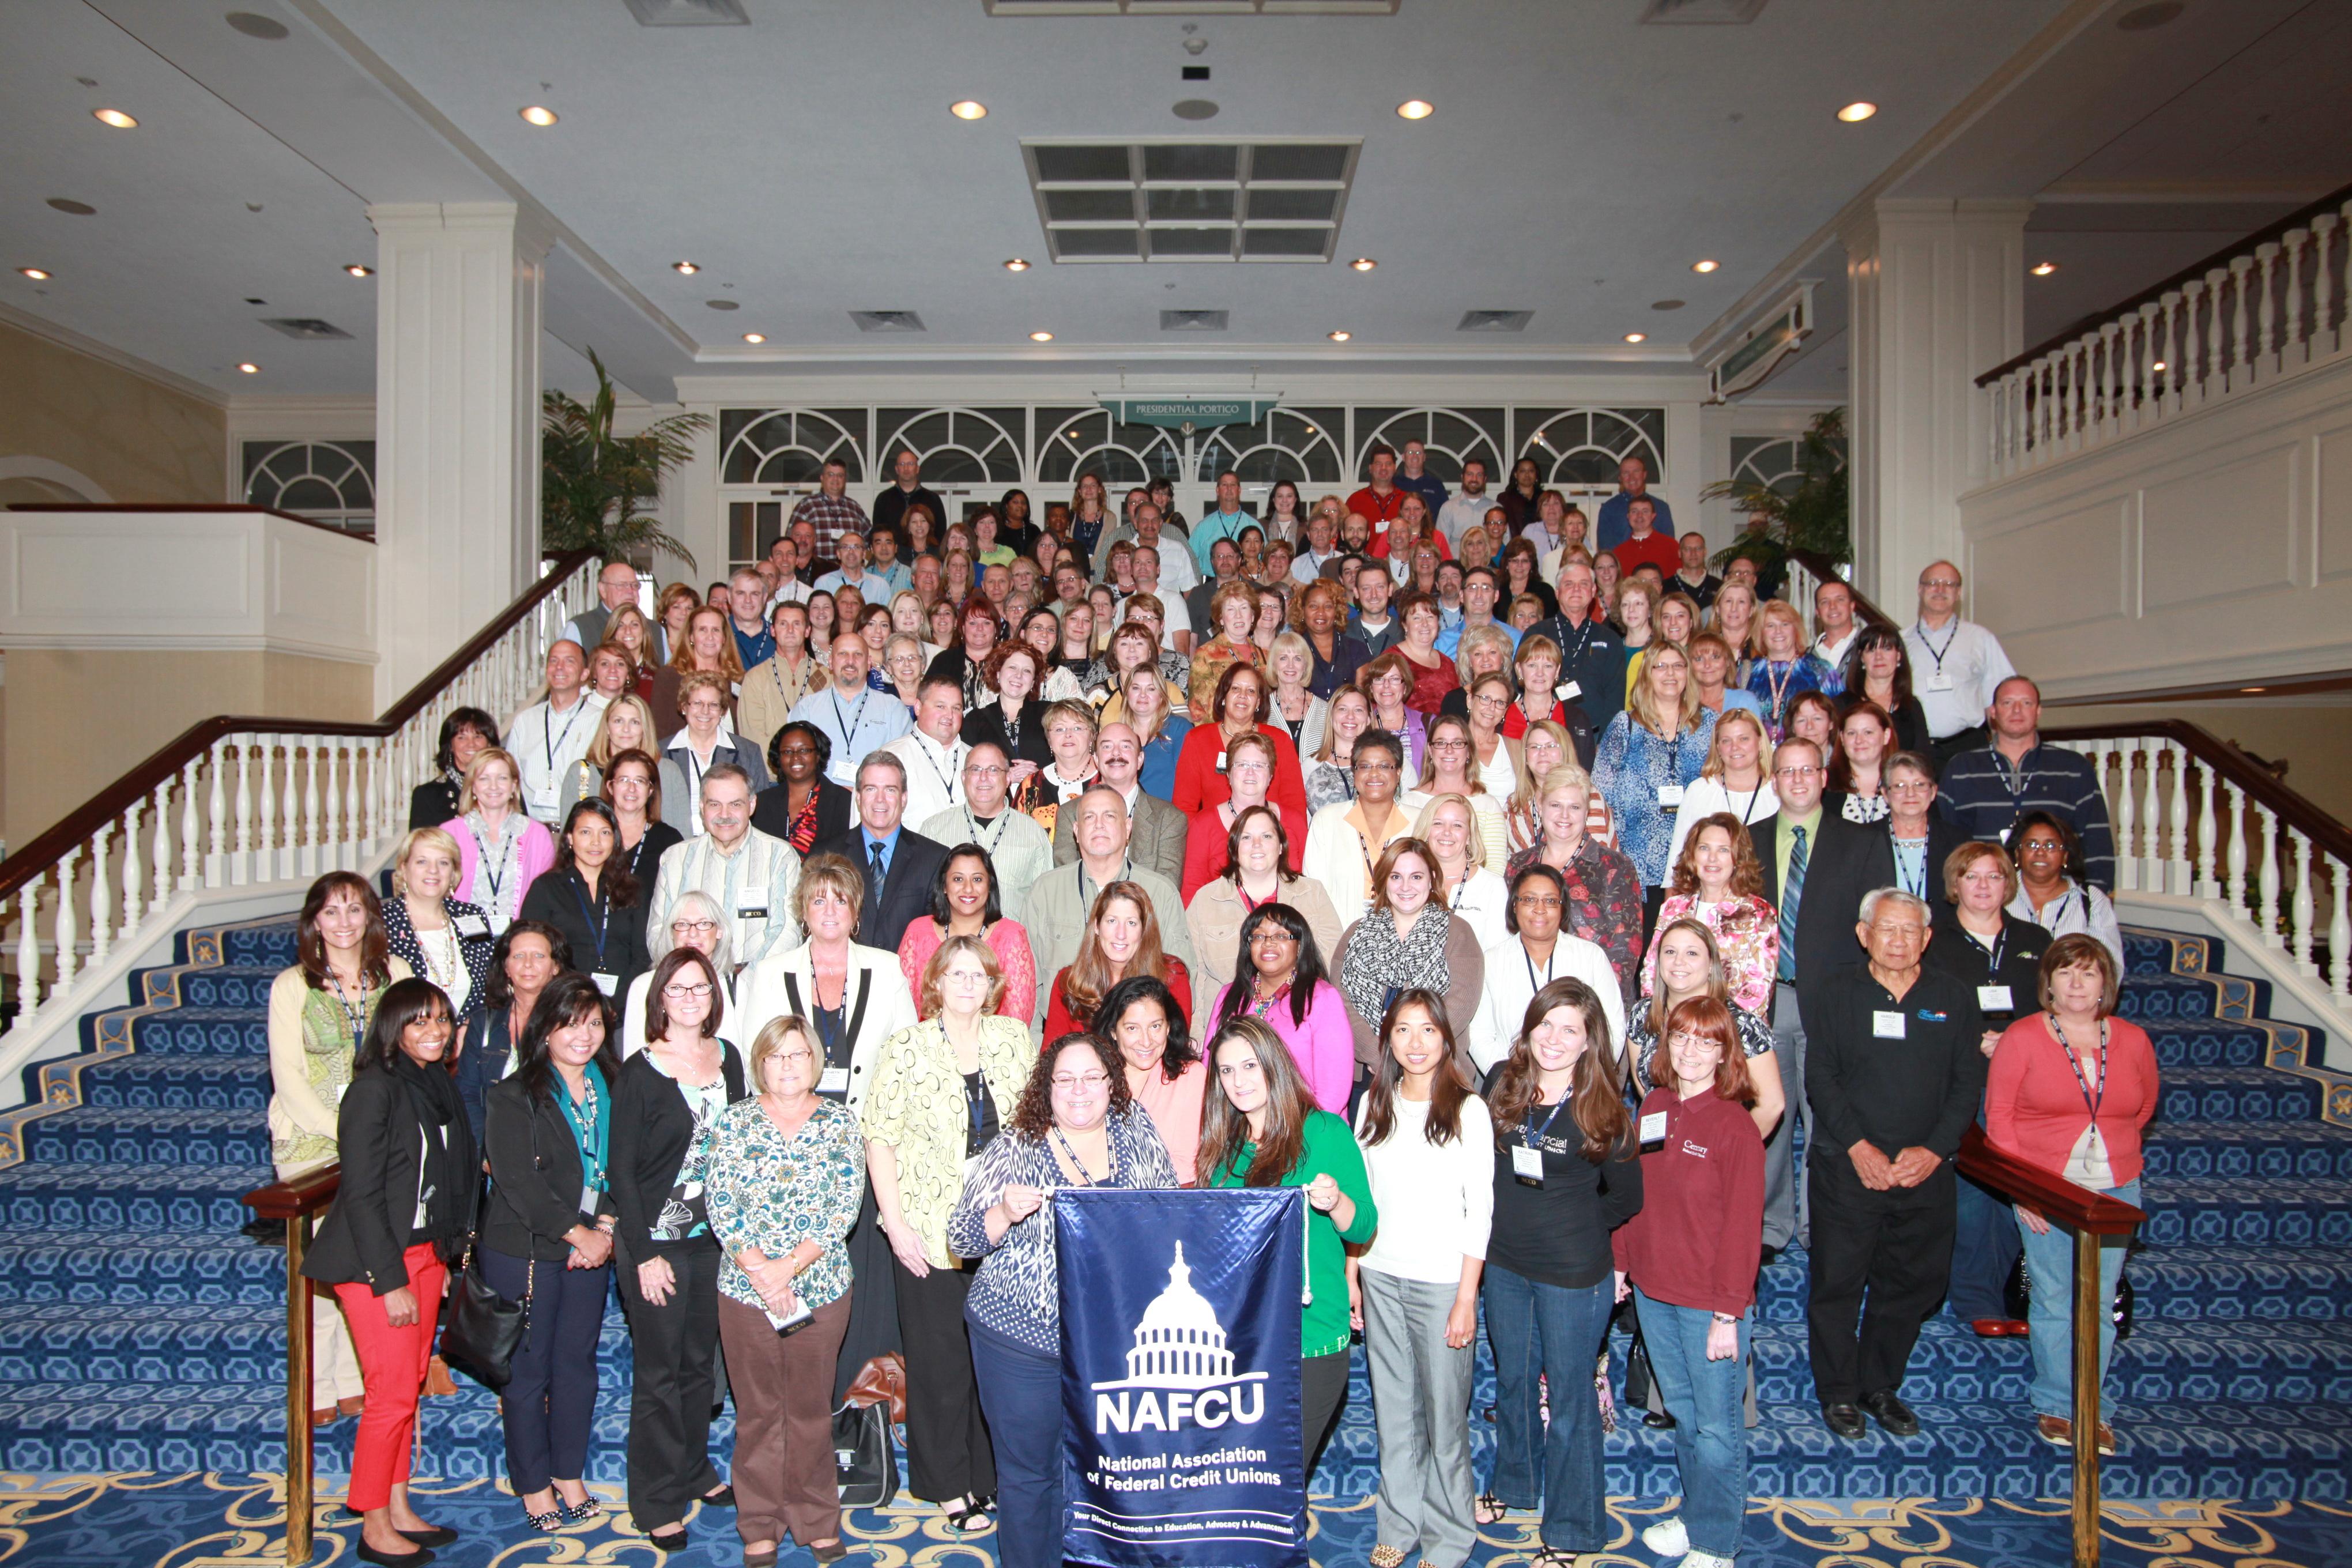 NAFCU Reg Compliance Seminar 2013